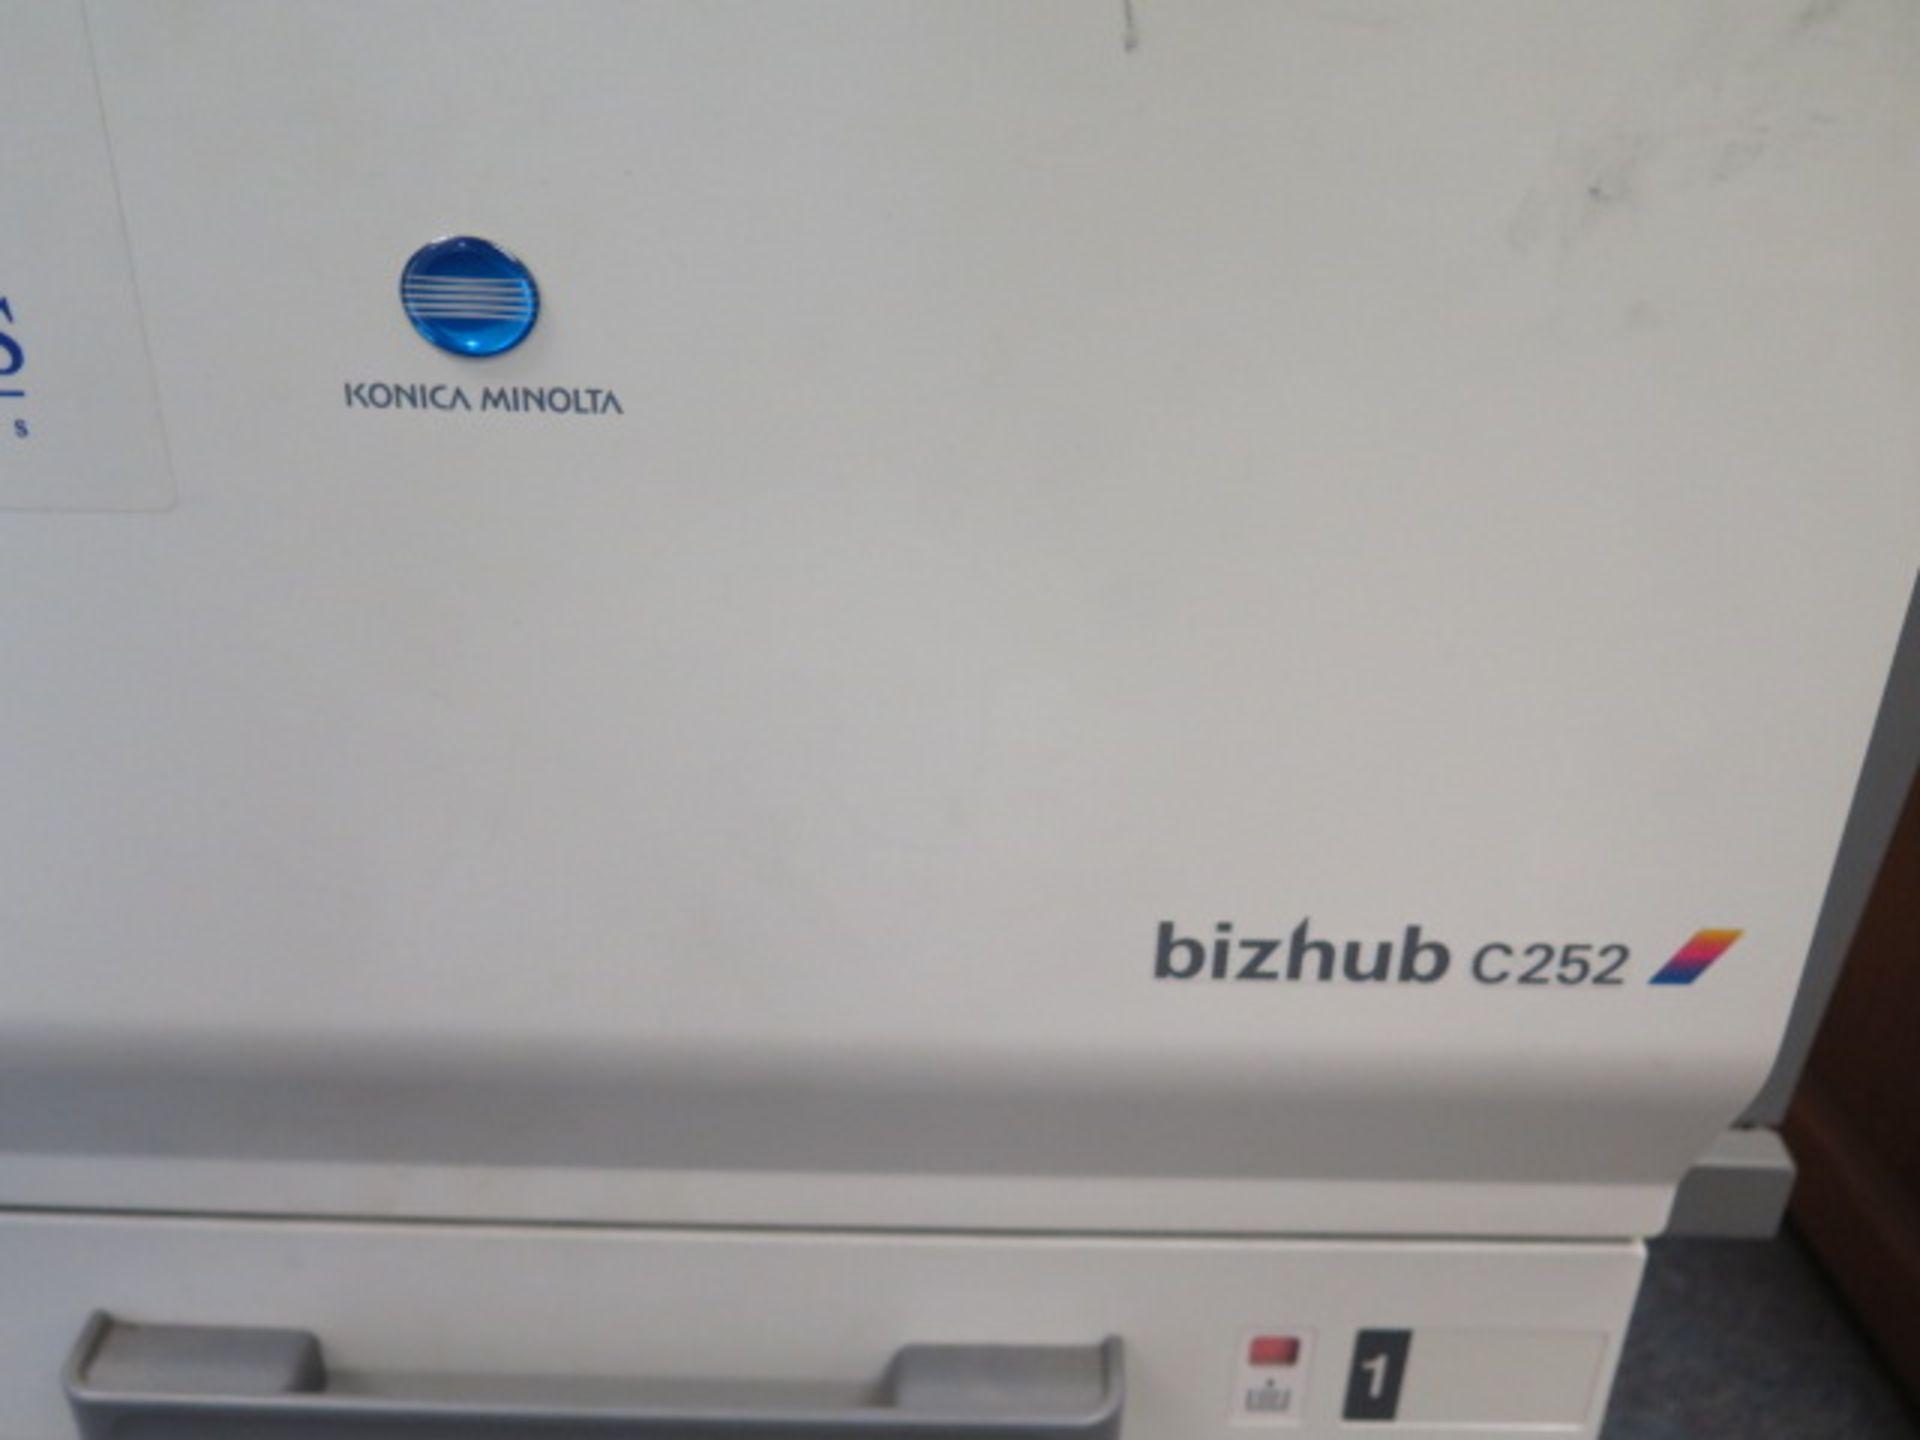 Konica Minolta bizhub C252 Color Copy Machine - Image 4 of 5